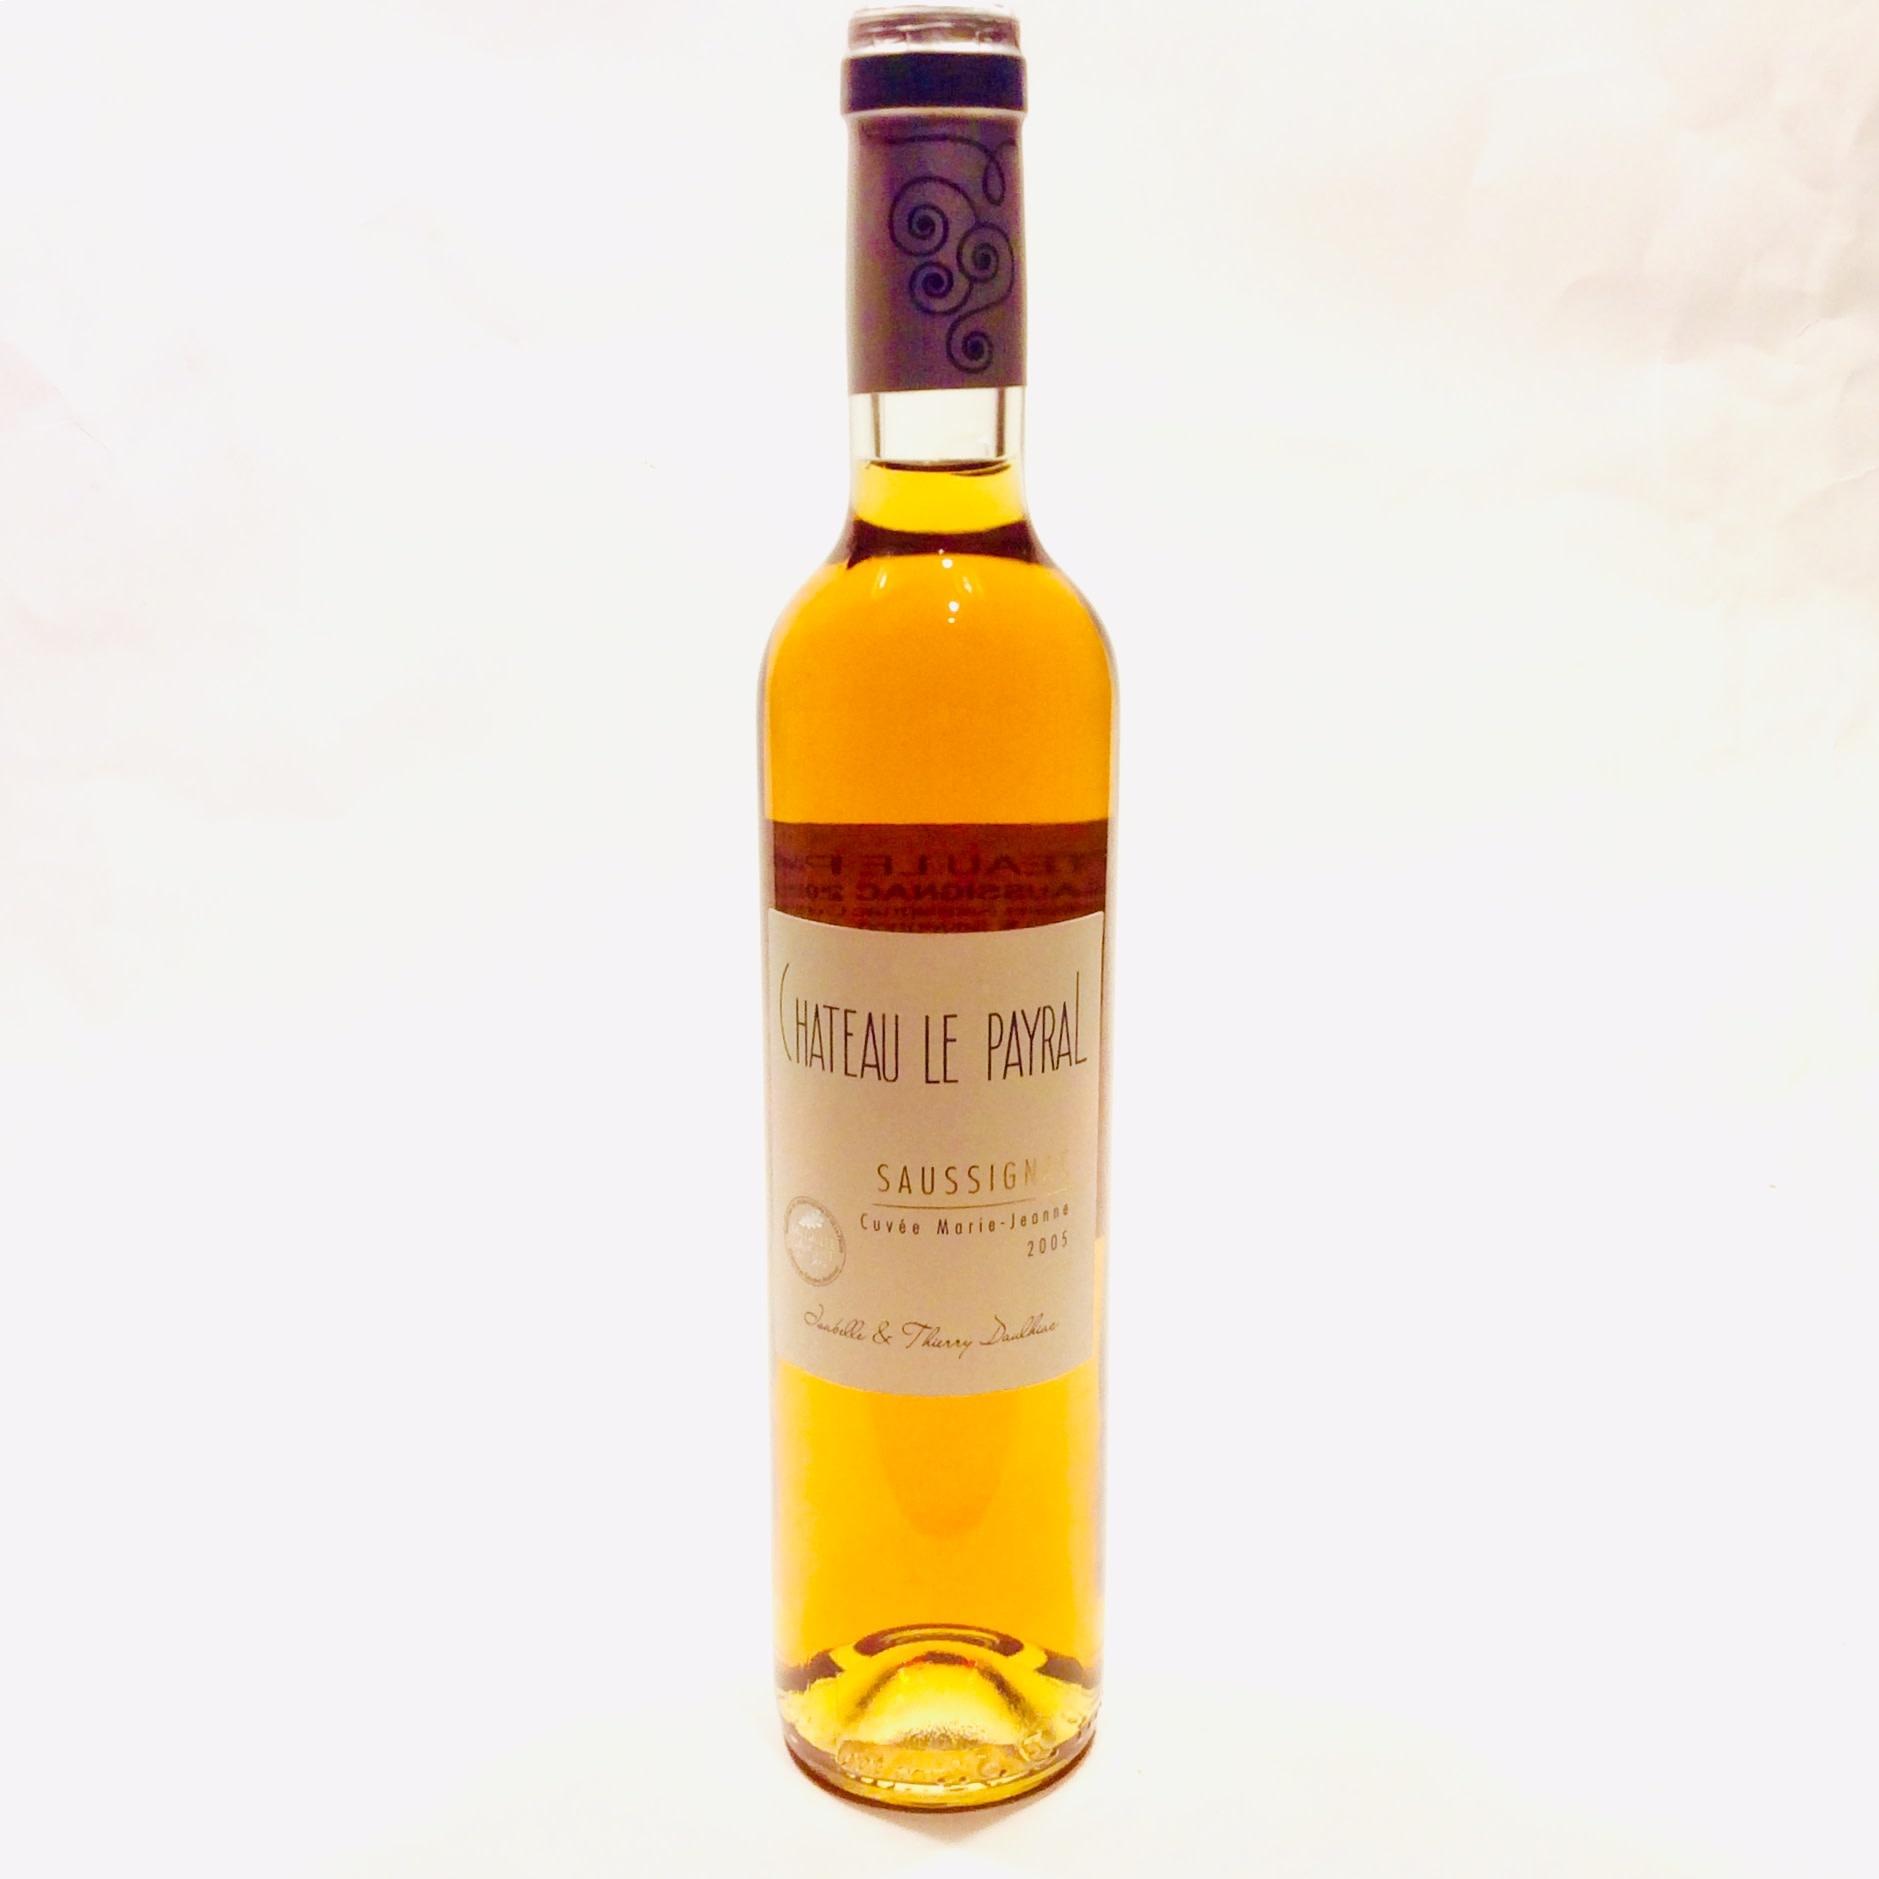 Le Payral - Saussignac 2005 (500 ml)